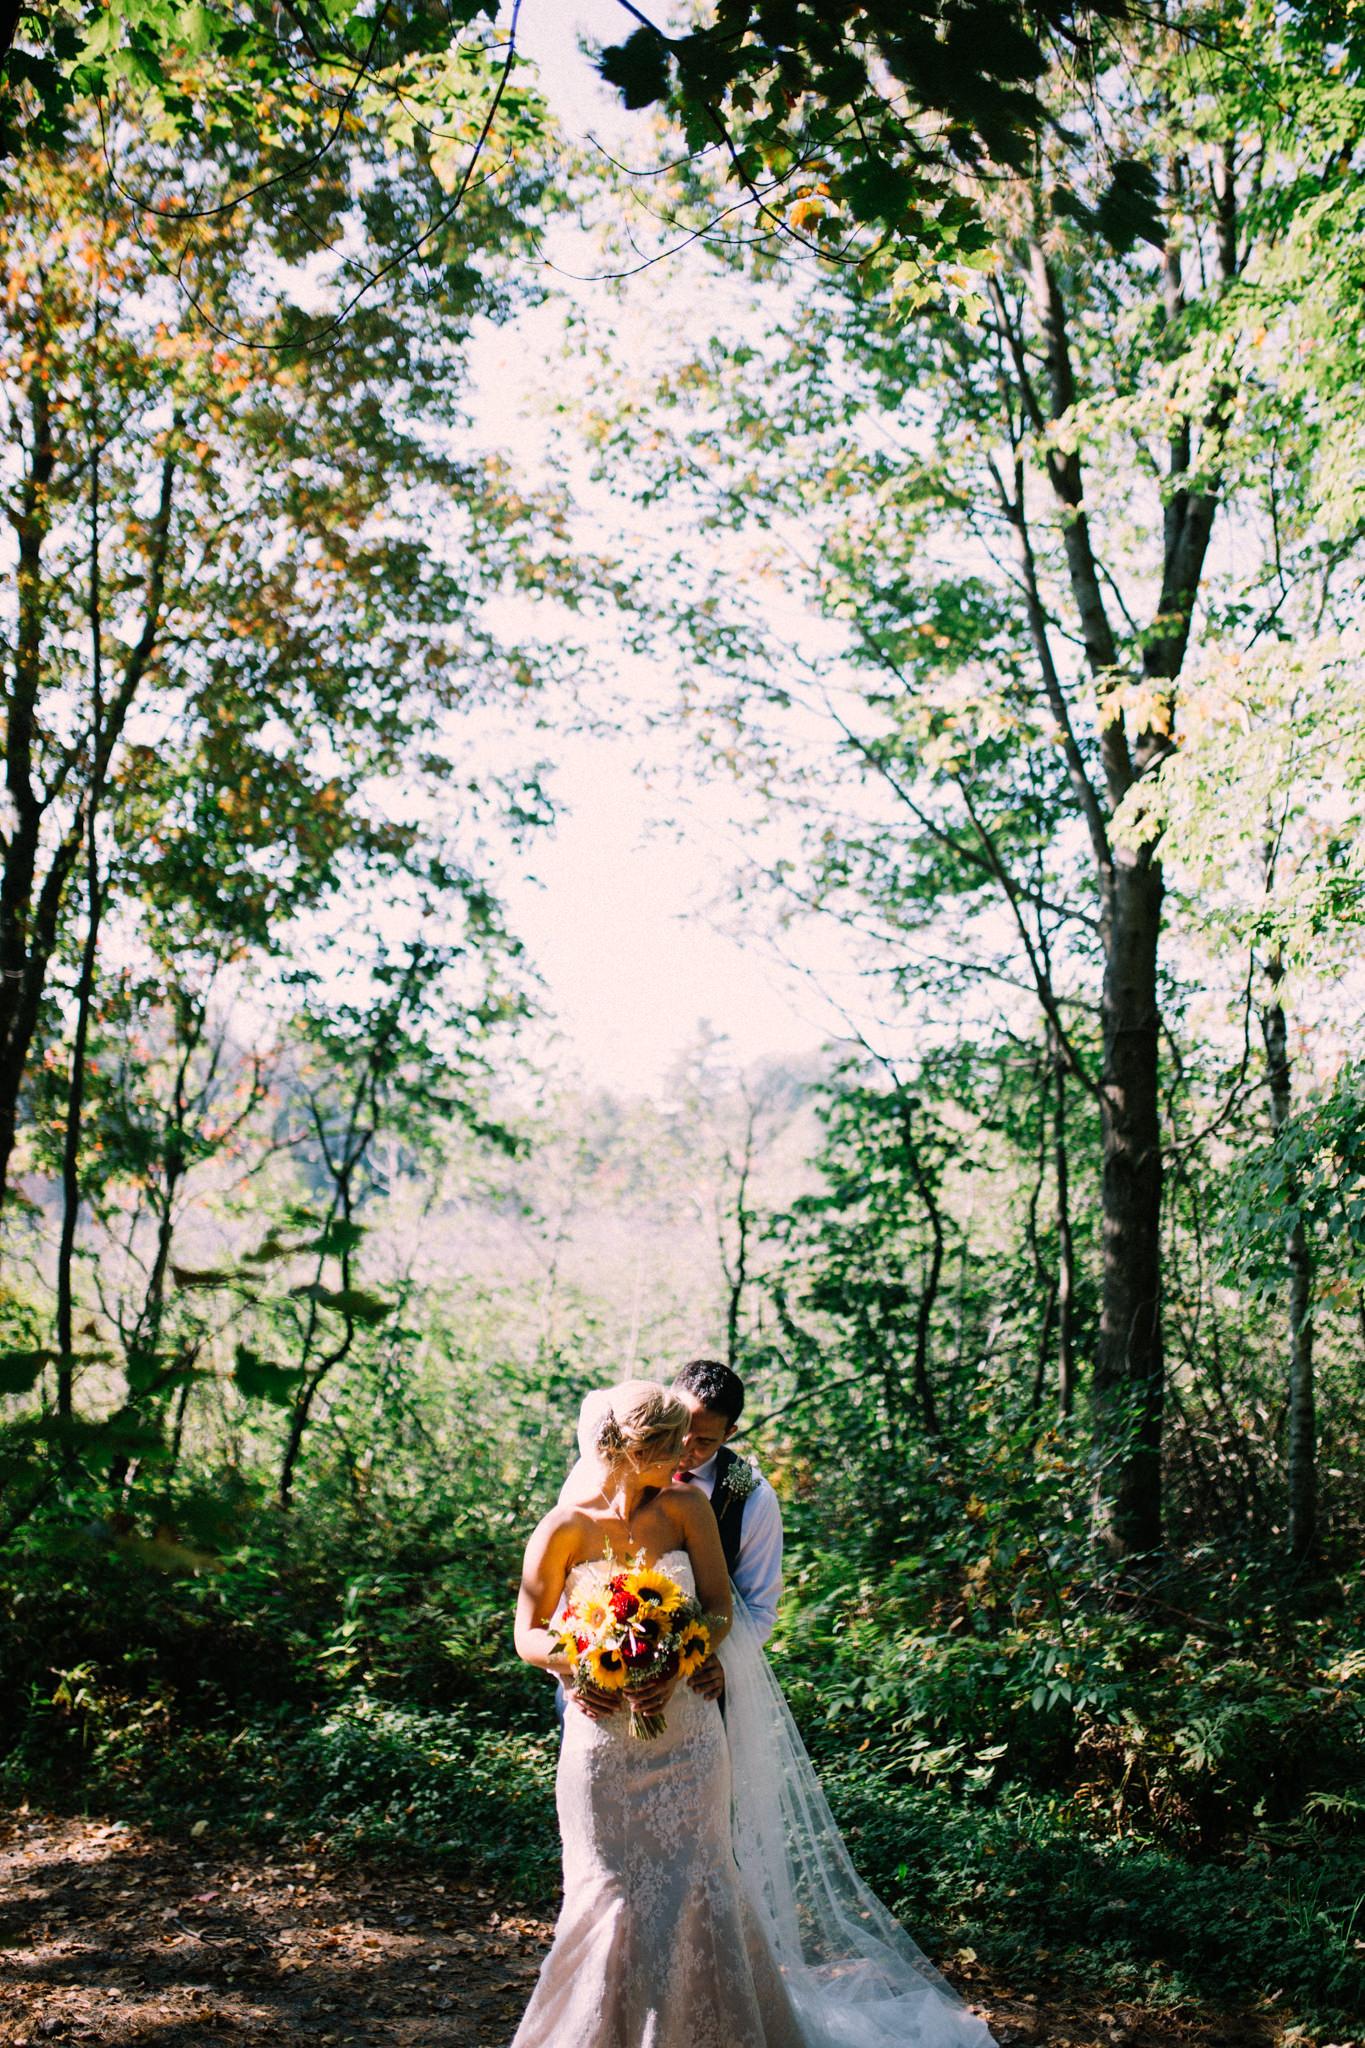 Muskoka rustic farm wedding at Brookland Farm by Max Wong Photo (30)